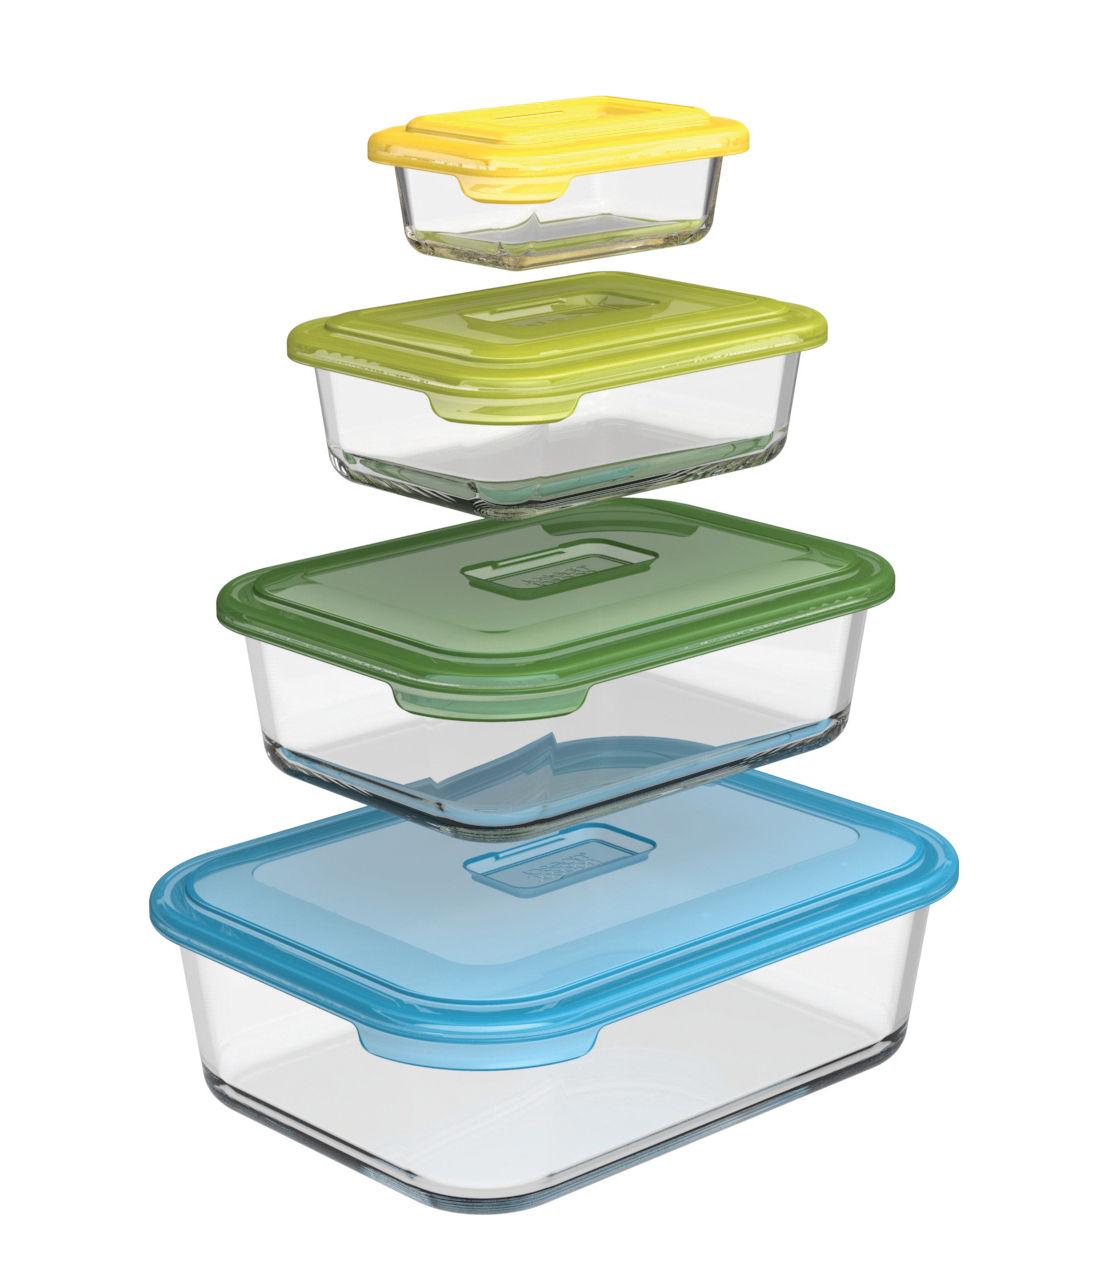 Tischkultur - Platten - Nest glass storage Vorratsdose / Glas-Auflaufform - 4er-Set - Joseph Joseph - Mehrfarbig - Kunststoff ohne BPA, Verre borosilicaté